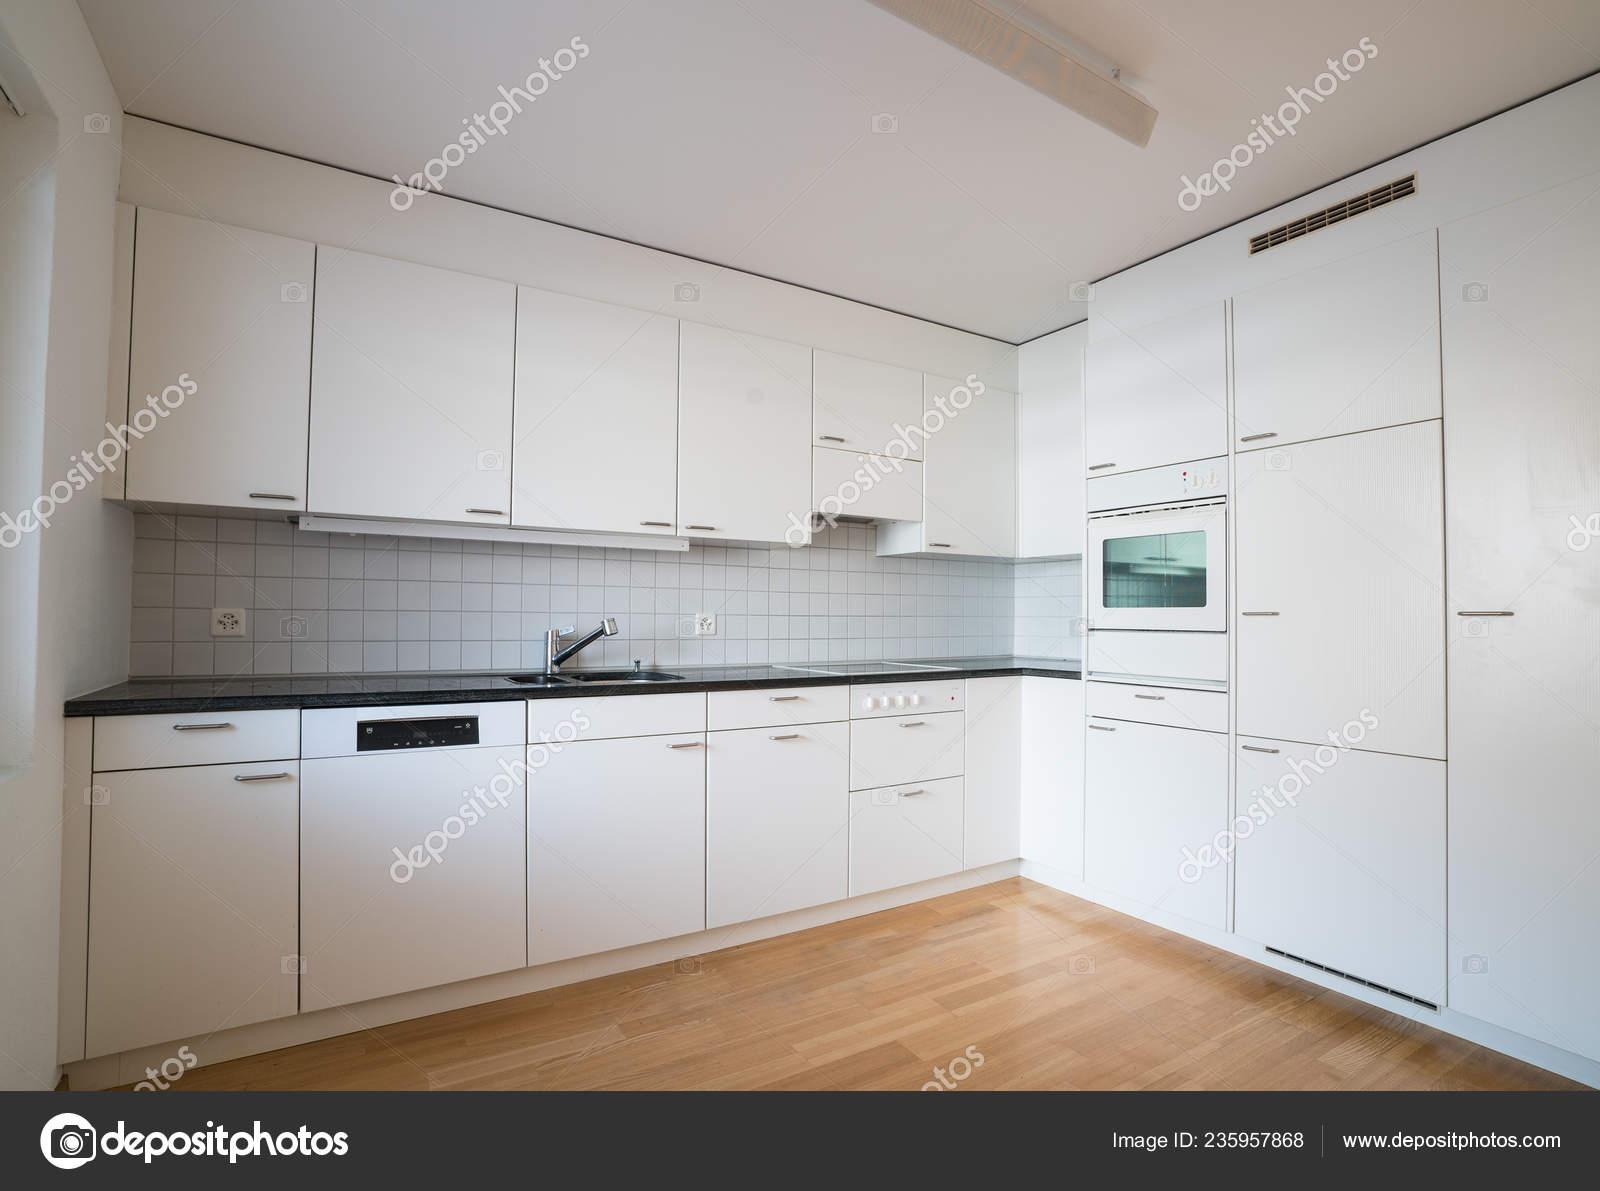 Modern Bright Kitchen Empty Refurbished Apartment Black Granite Work Surface Stock Photo C Makasanaphoto 235957868